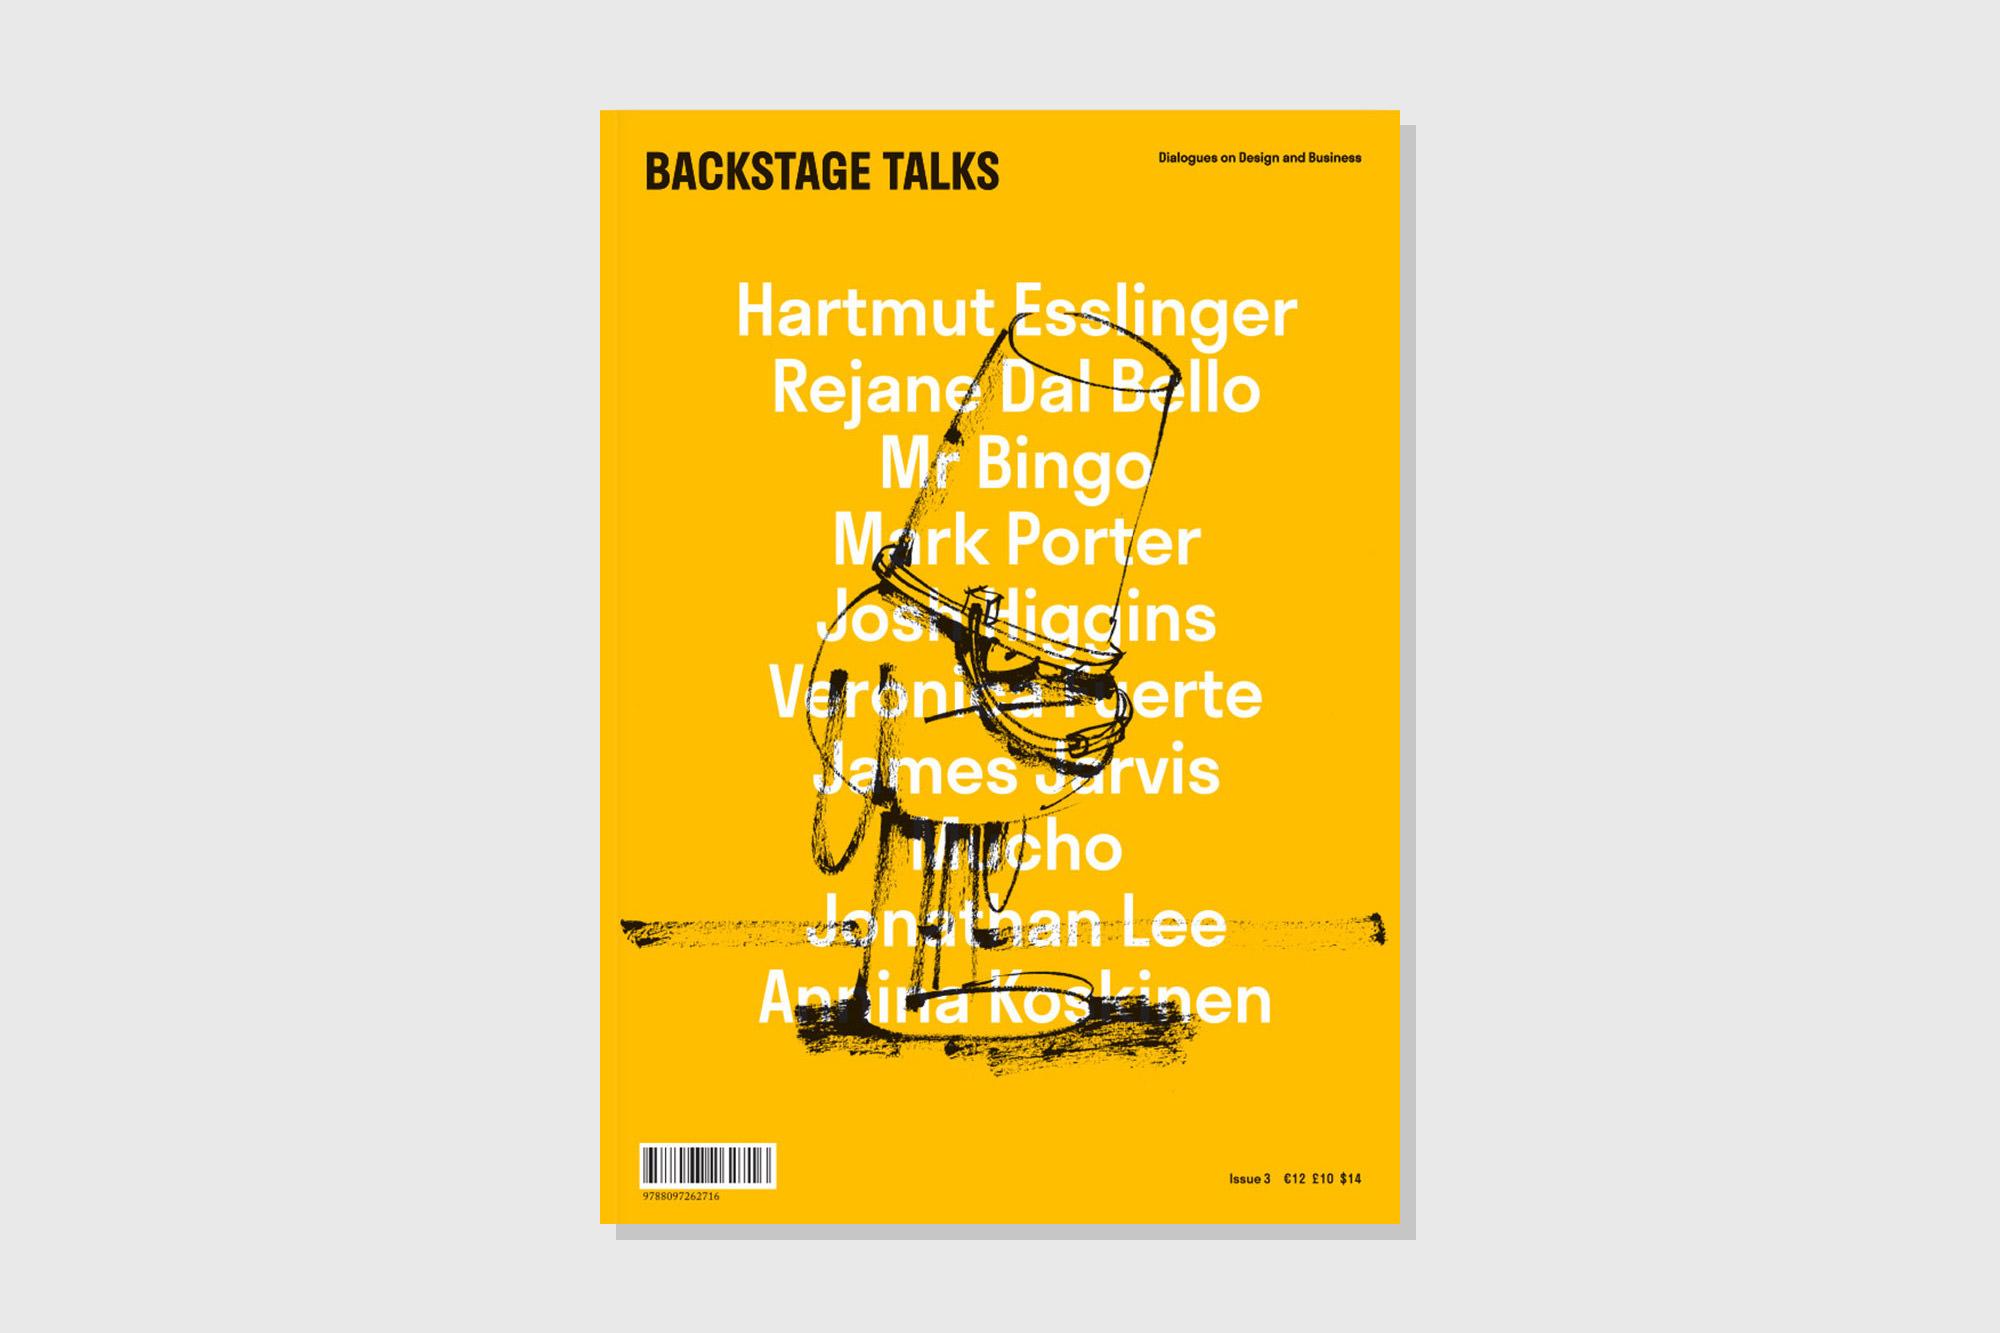 backstage talk magazine